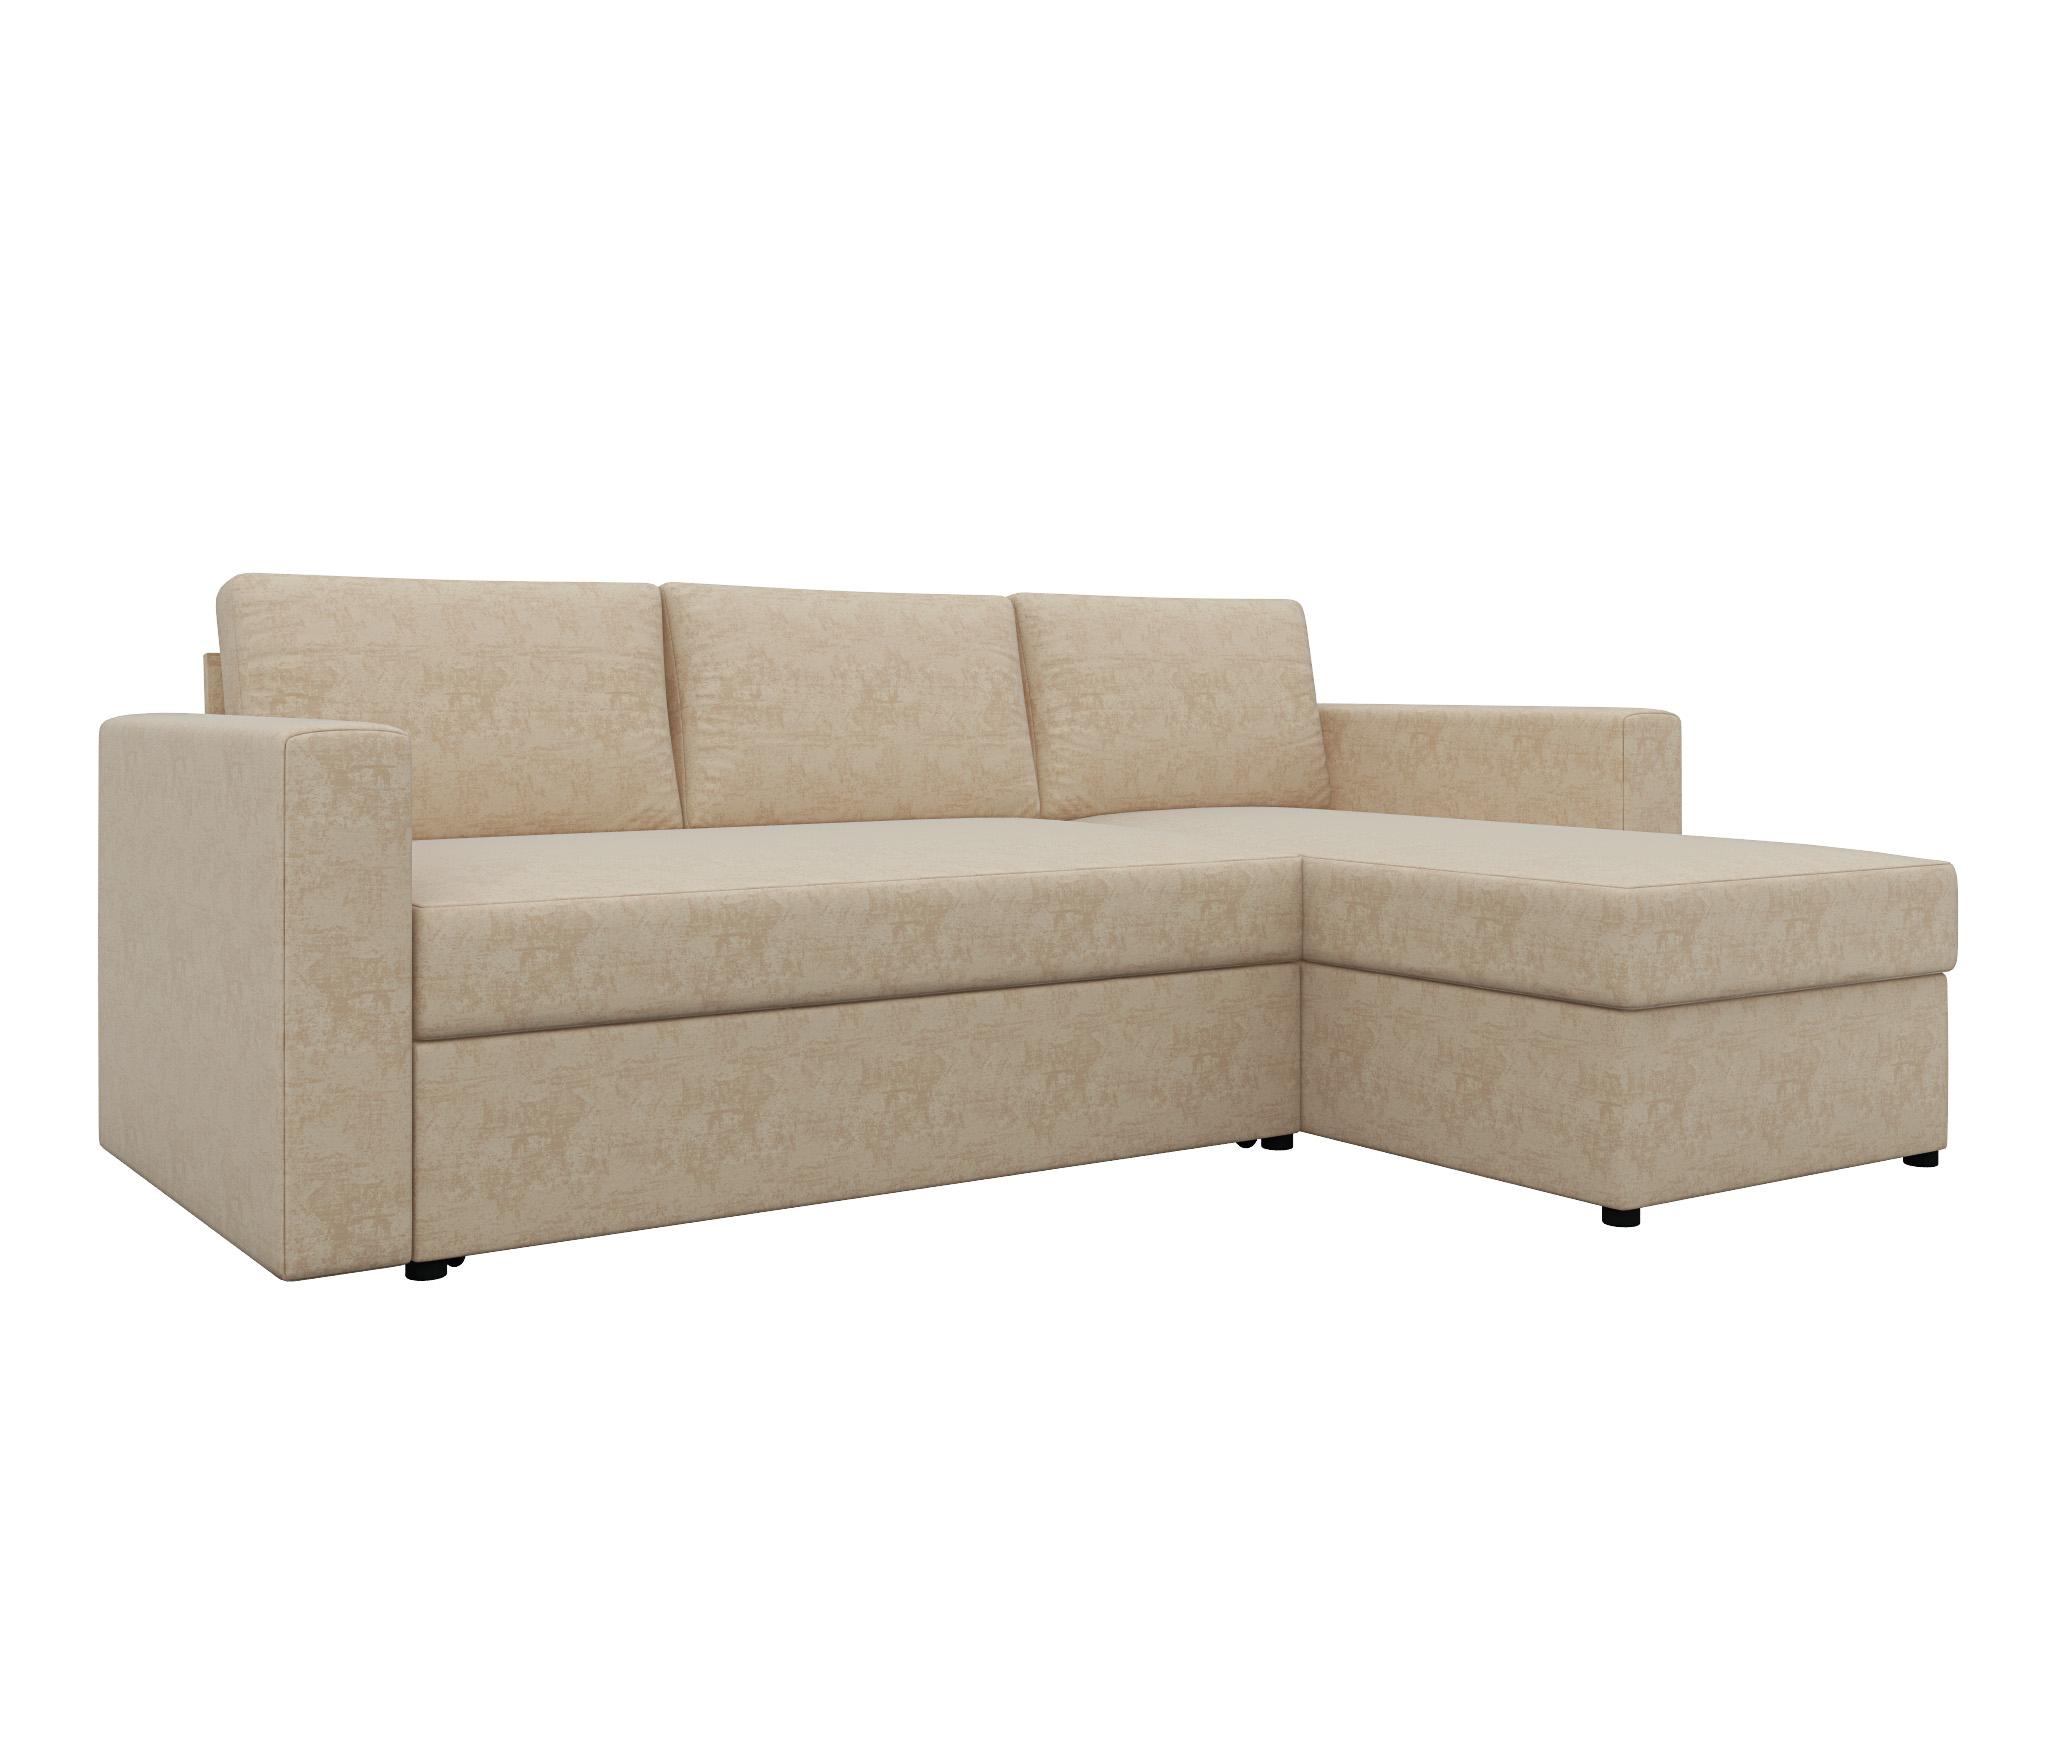 Угловой диван Траумберг (Турин) велюрМягкая мебель<br><br><br>Длина мм: 2350<br>Высота мм: 850<br>Глубина мм: 1500